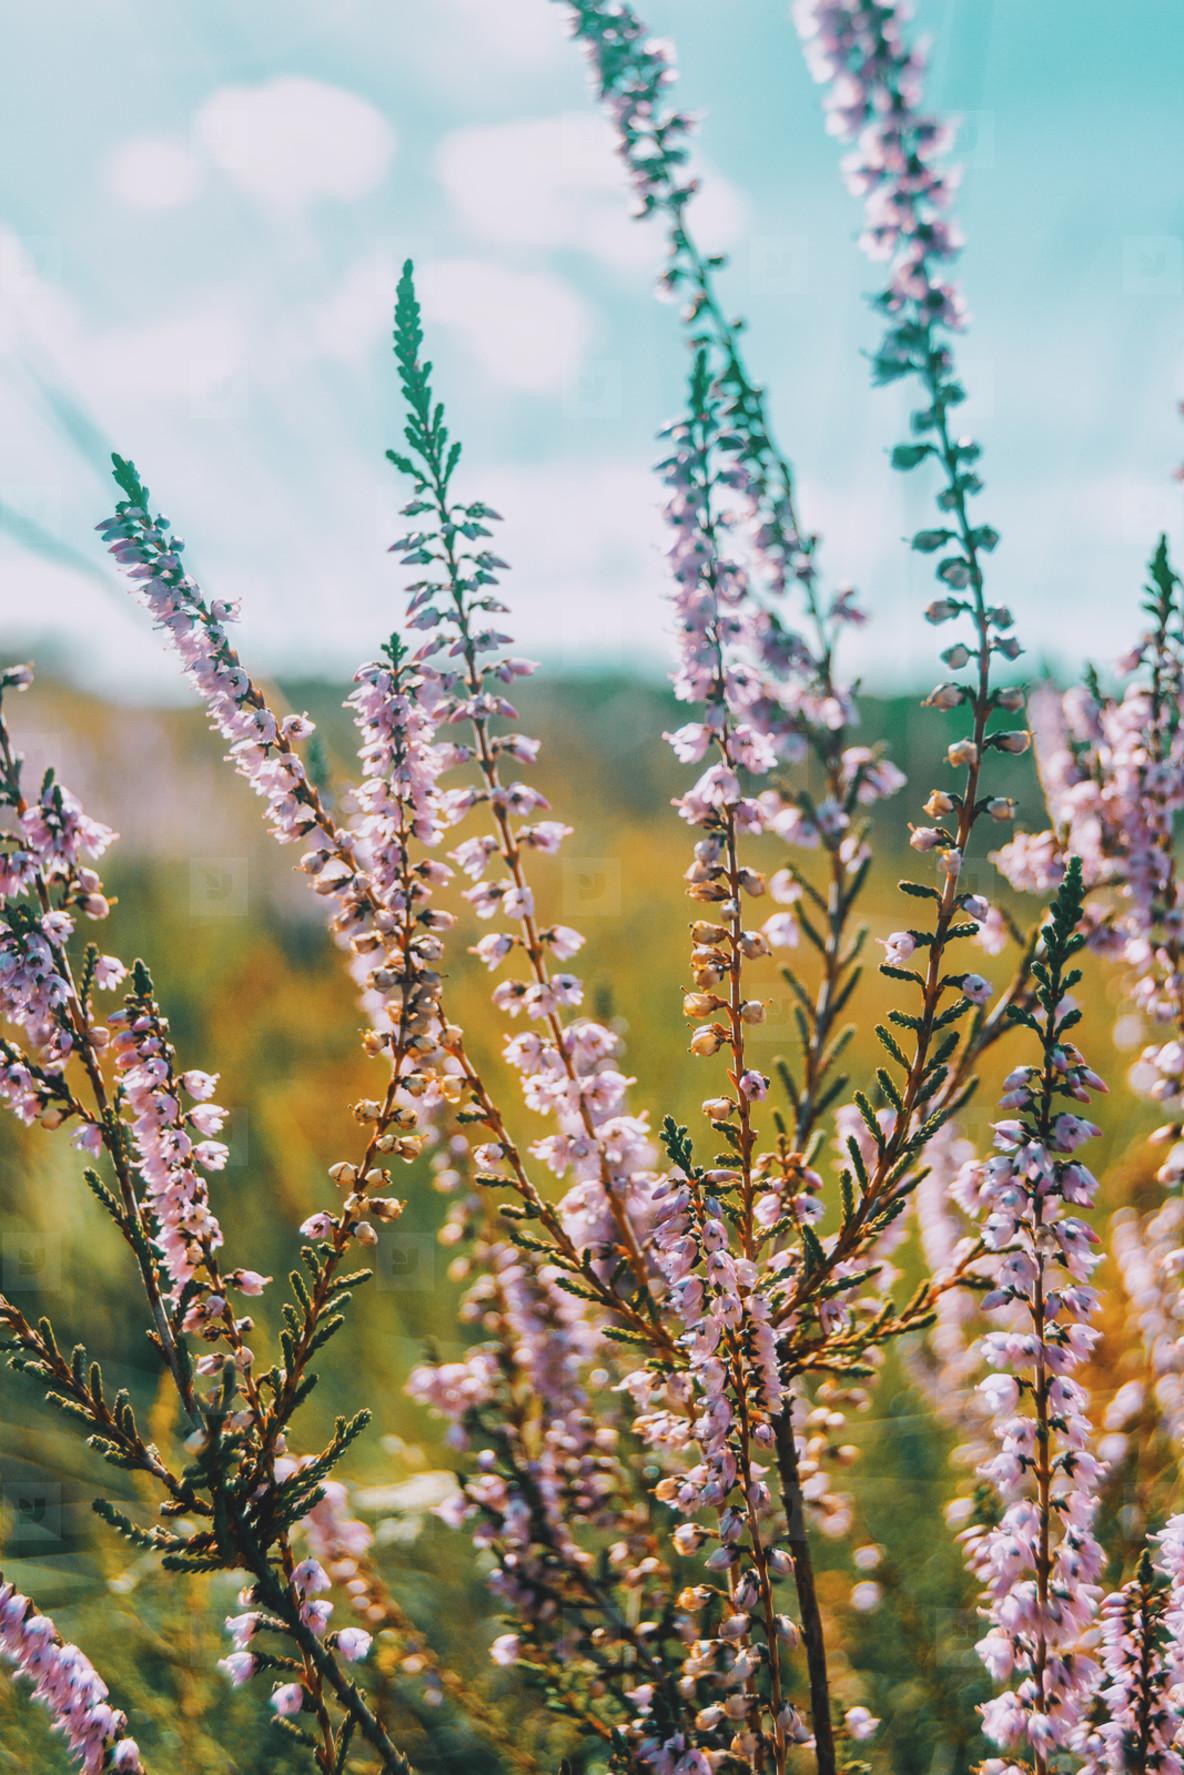 Lieblings Photos - pink flowers of calluna vulgaris in a field - YouWorkForThem &QZ_49